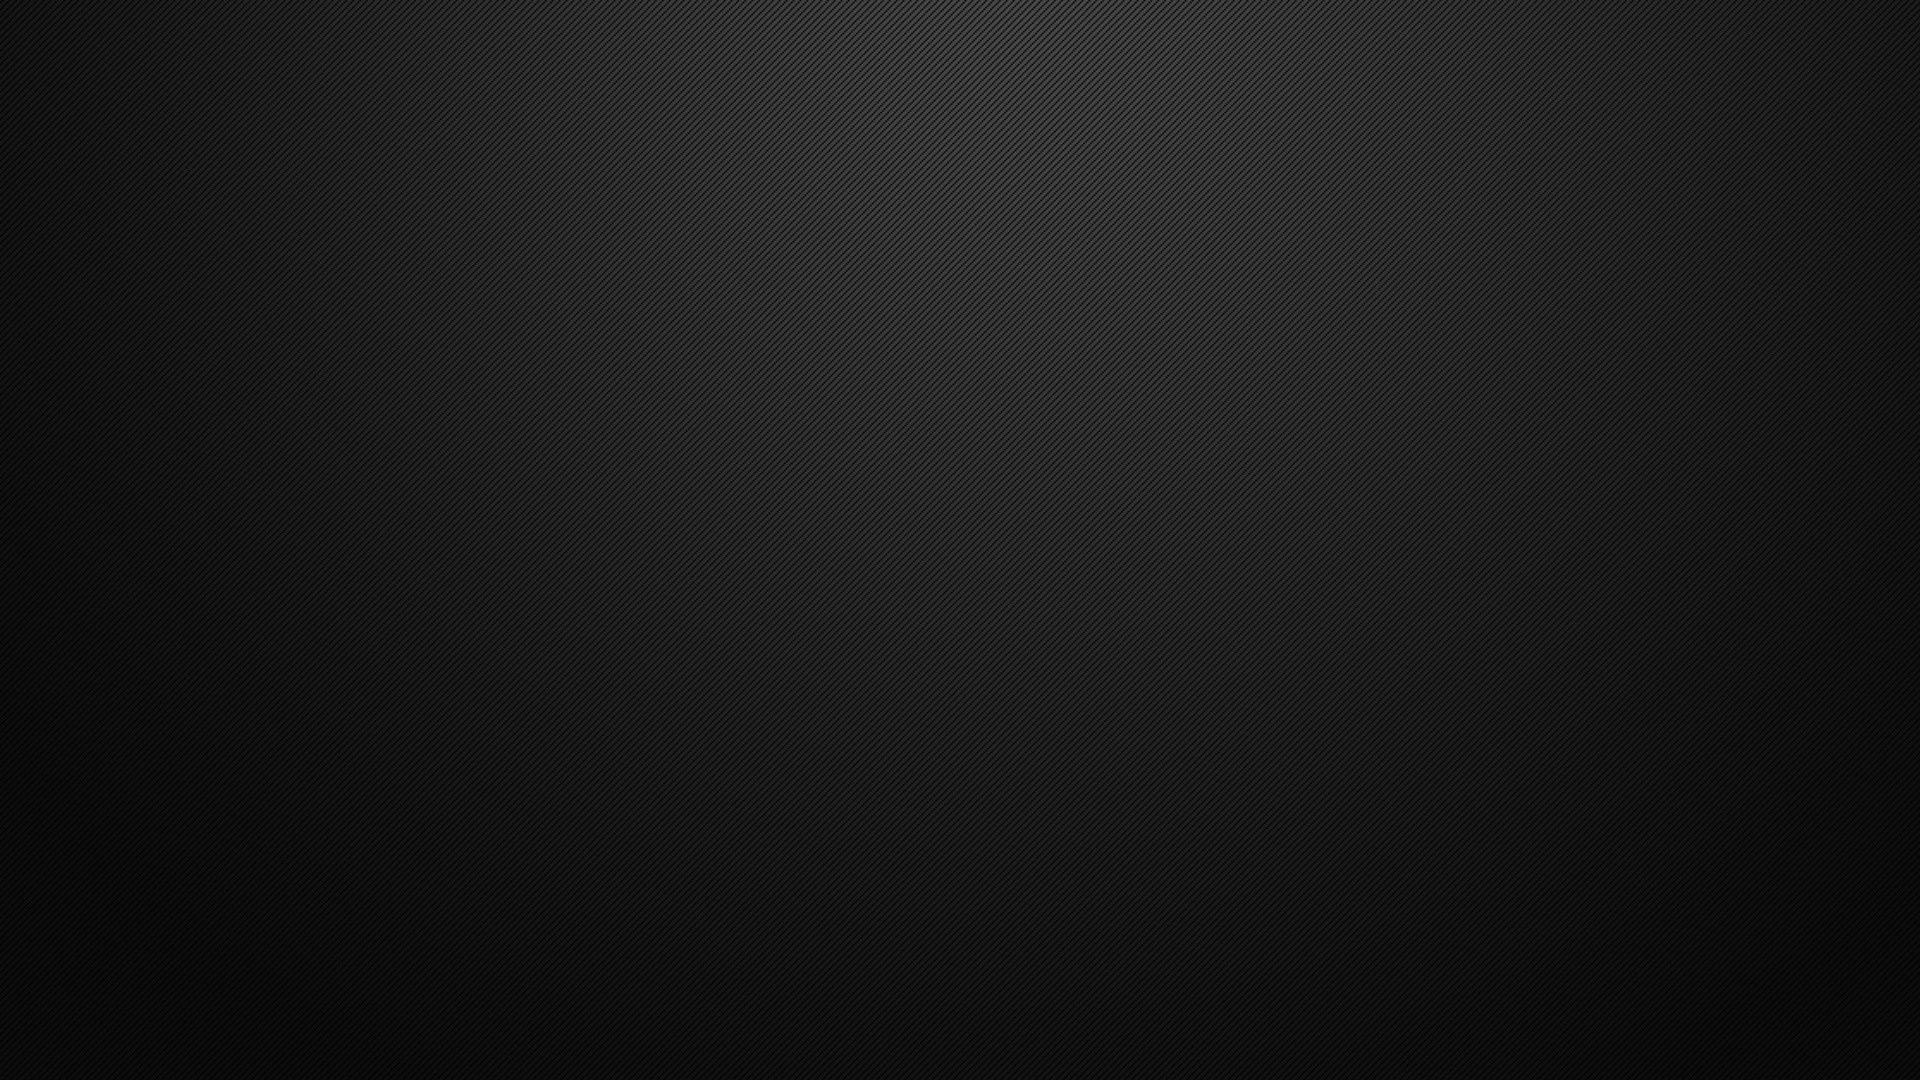 High Resolution Black Background desktop background free